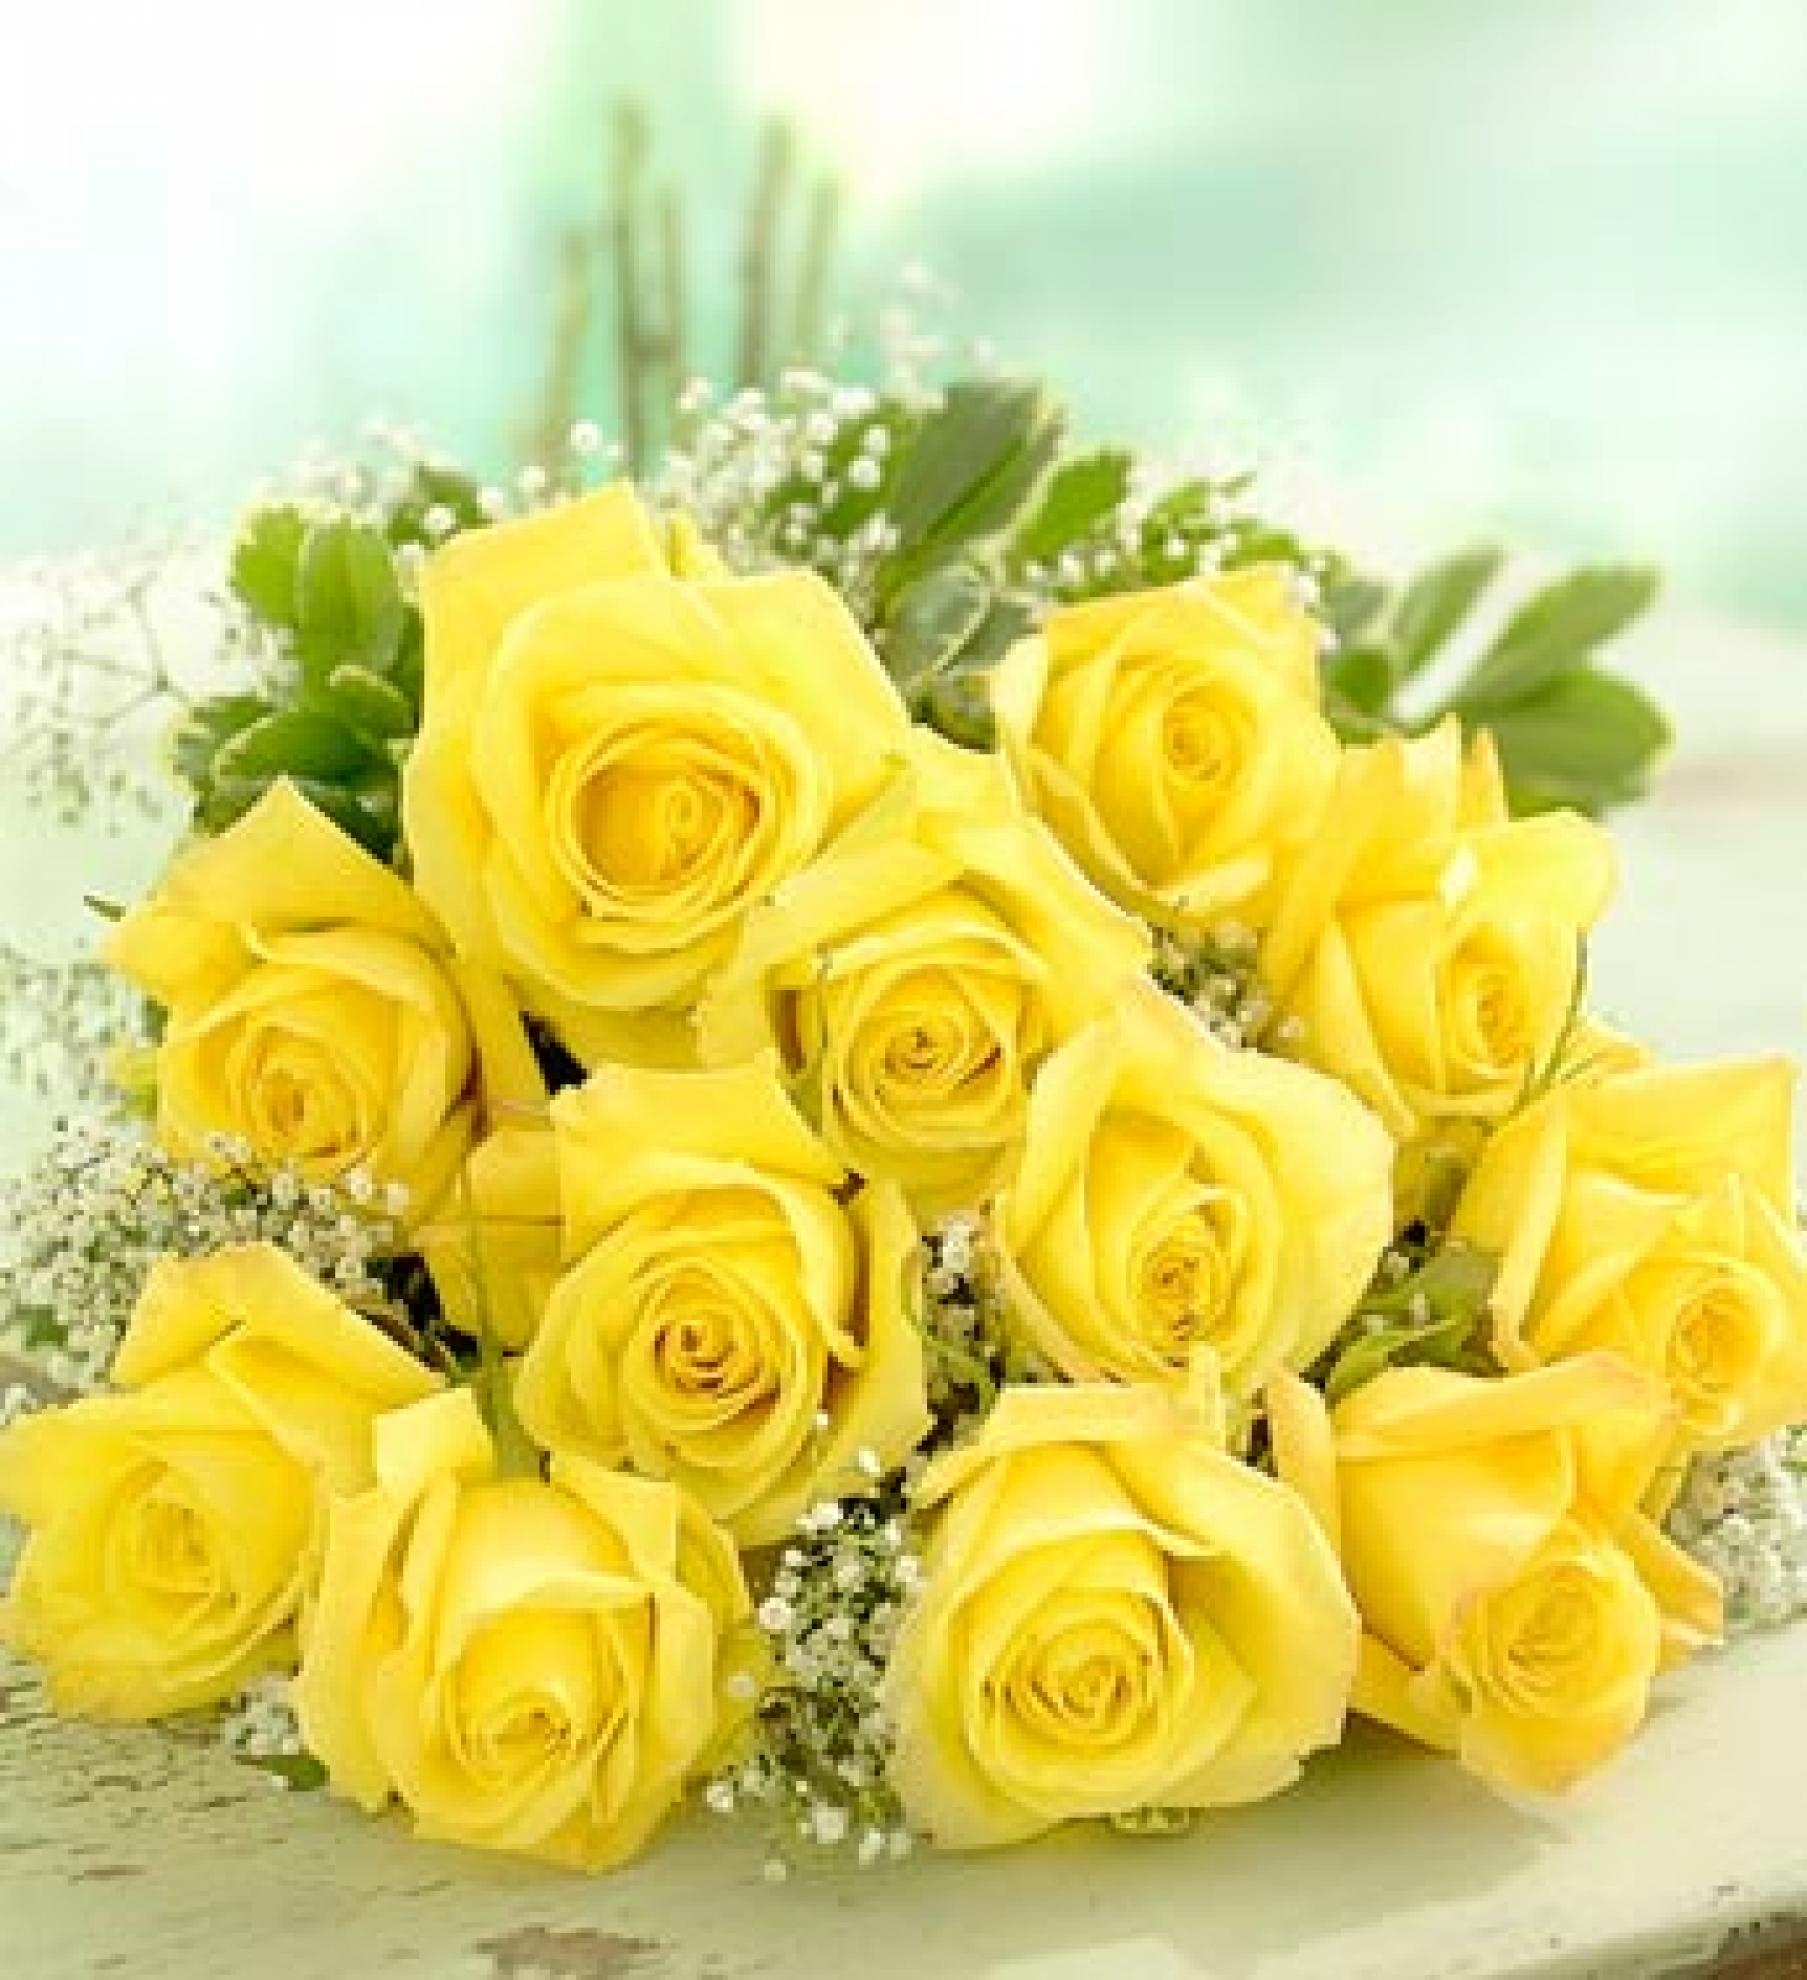 Buqu� Rosas Amarelas - BT02